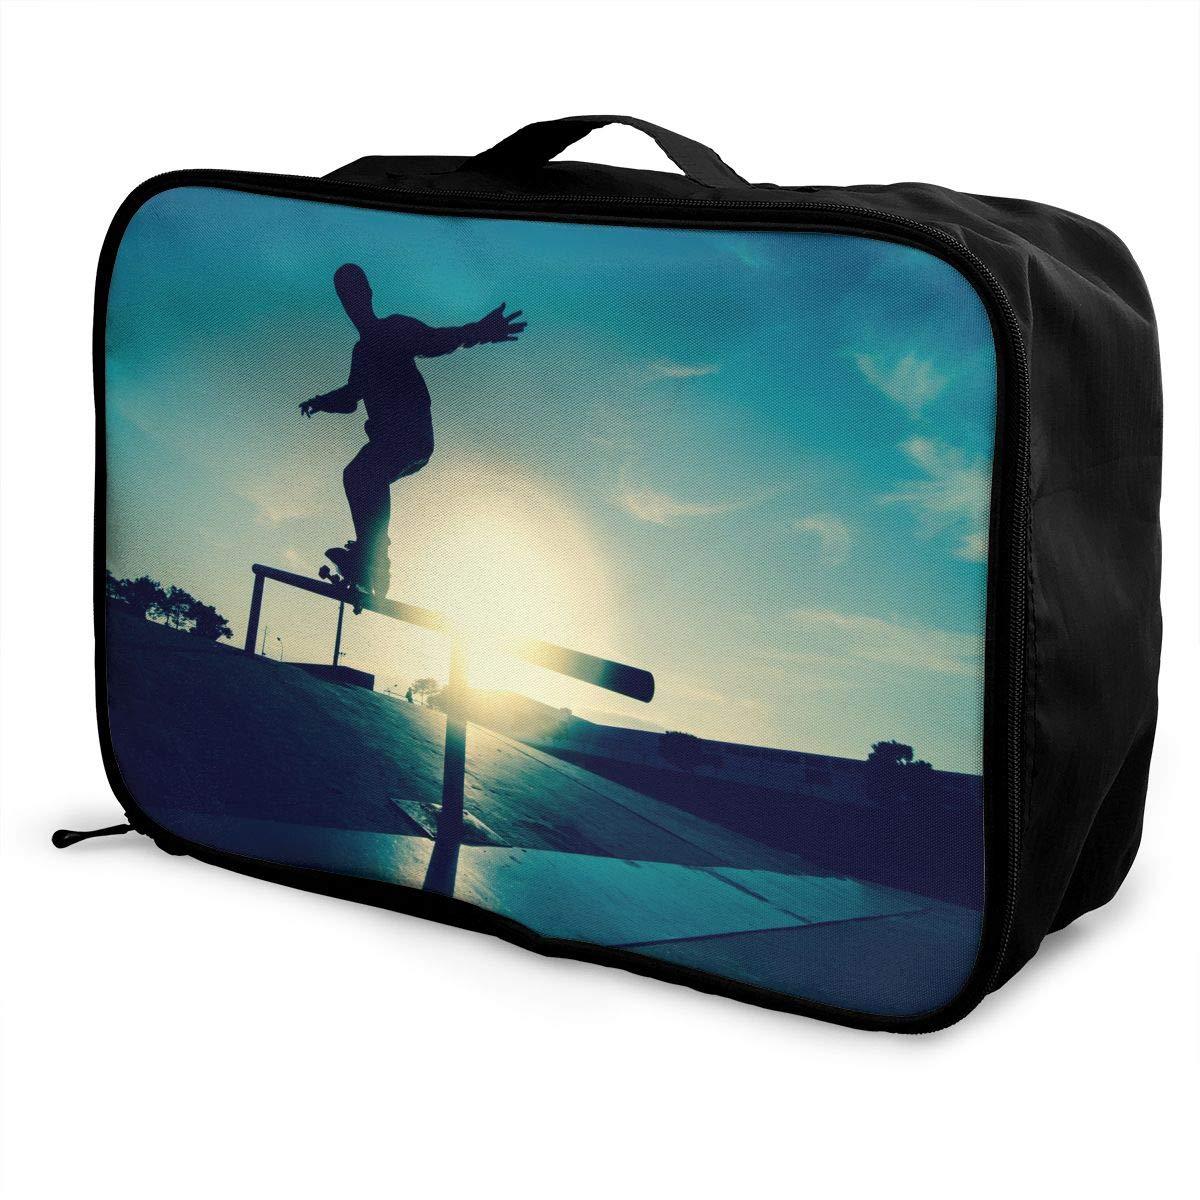 Travel Luggage Duffle Bag Lightweight Portable Handbag Skate Board Large Capacity Waterproof Foldable Storage Tote